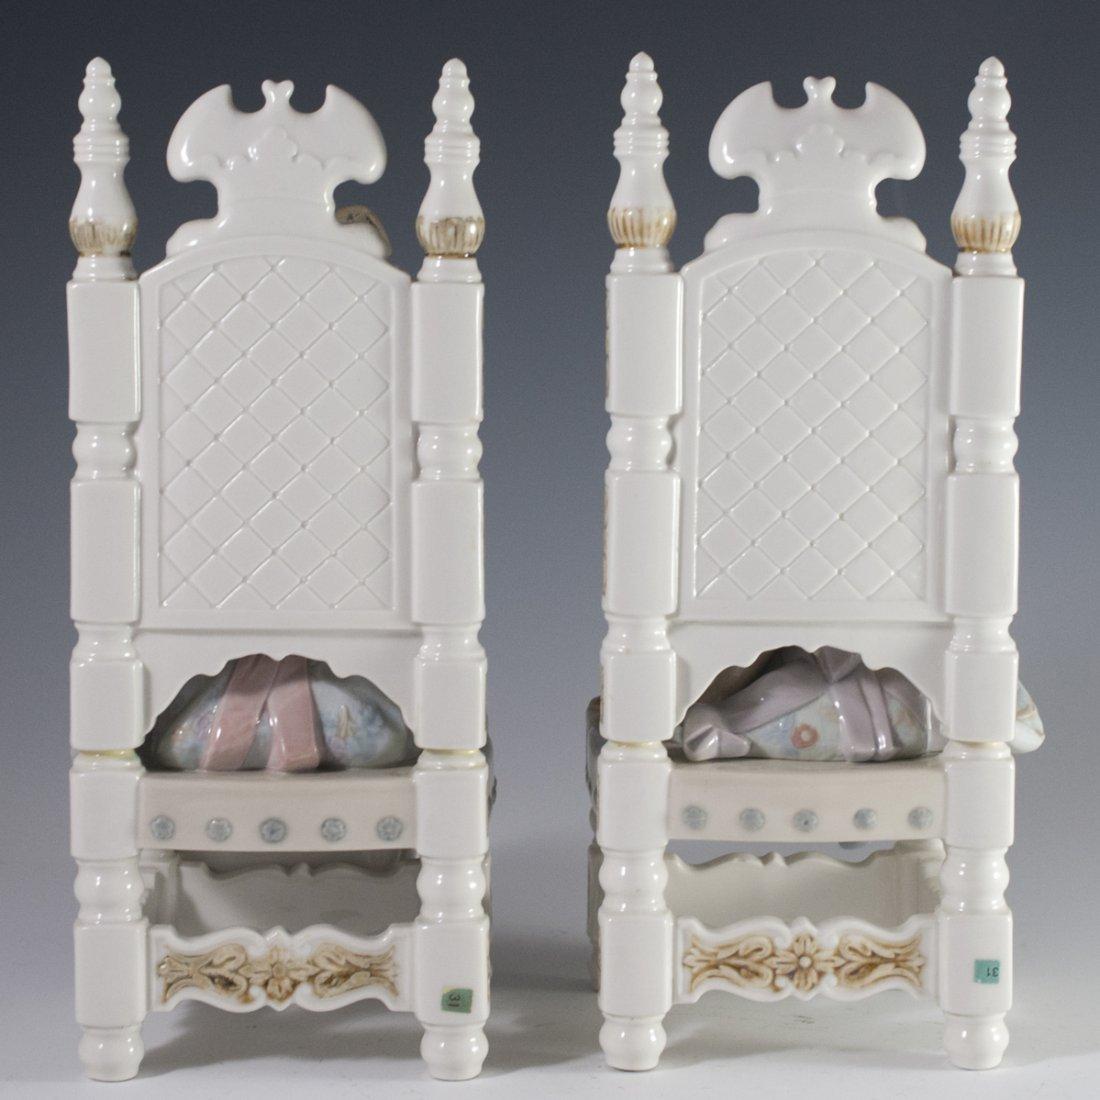 Lladro Porcelain Figurines - 4